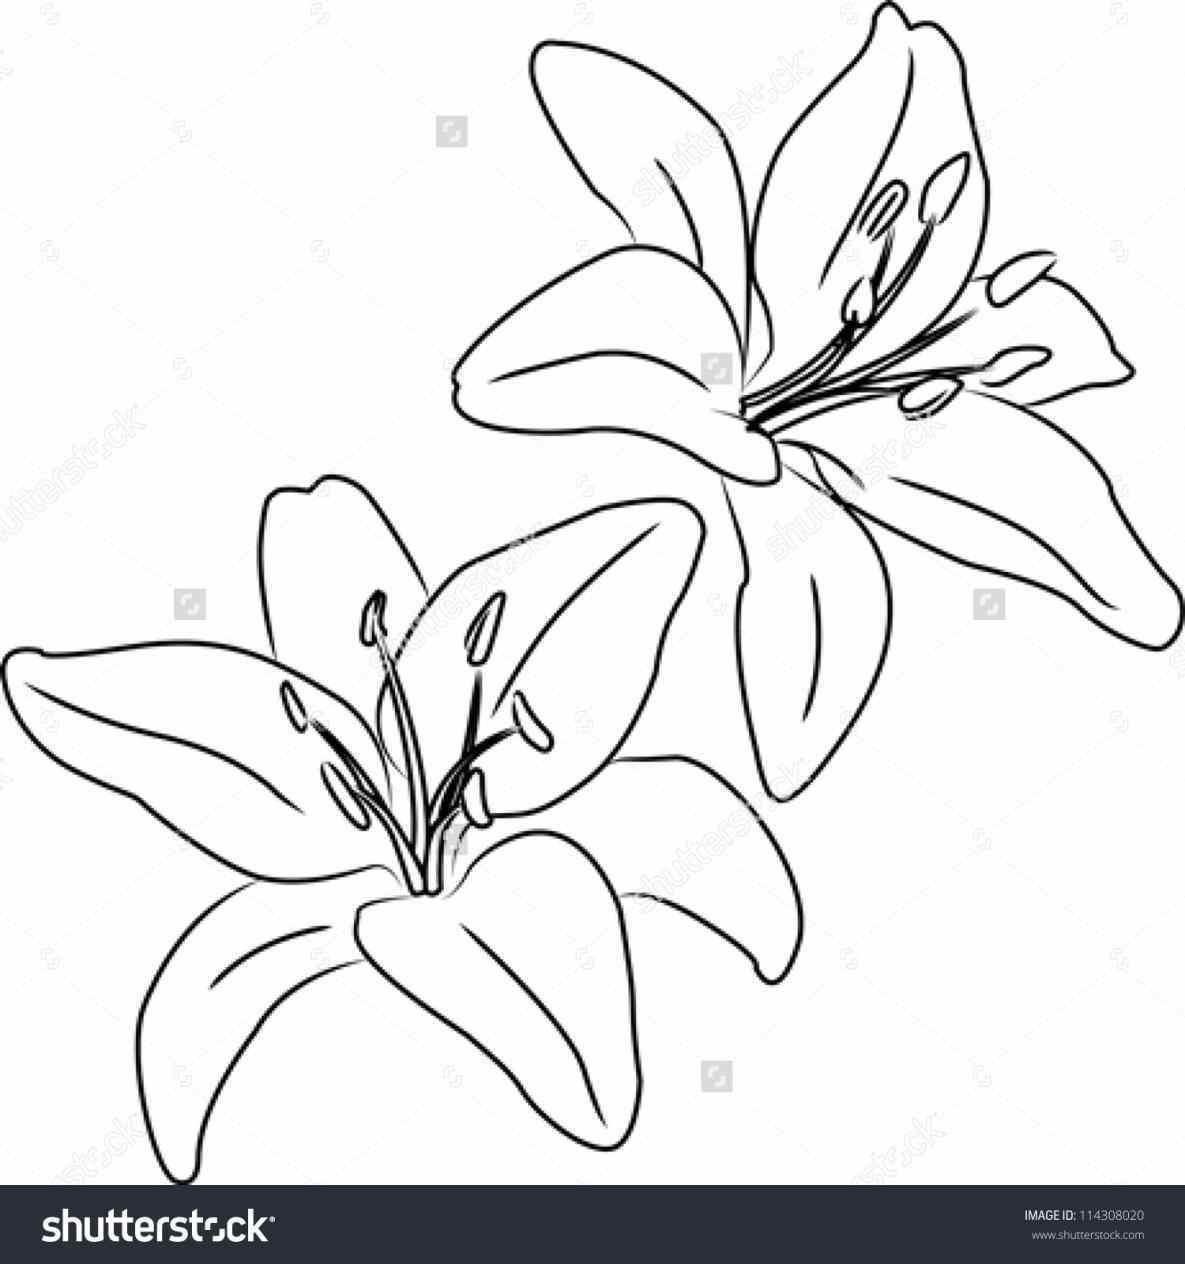 1185x1264 Daisy Flower Free Clip Art Summer Bouquet Of Grab Rose Vector